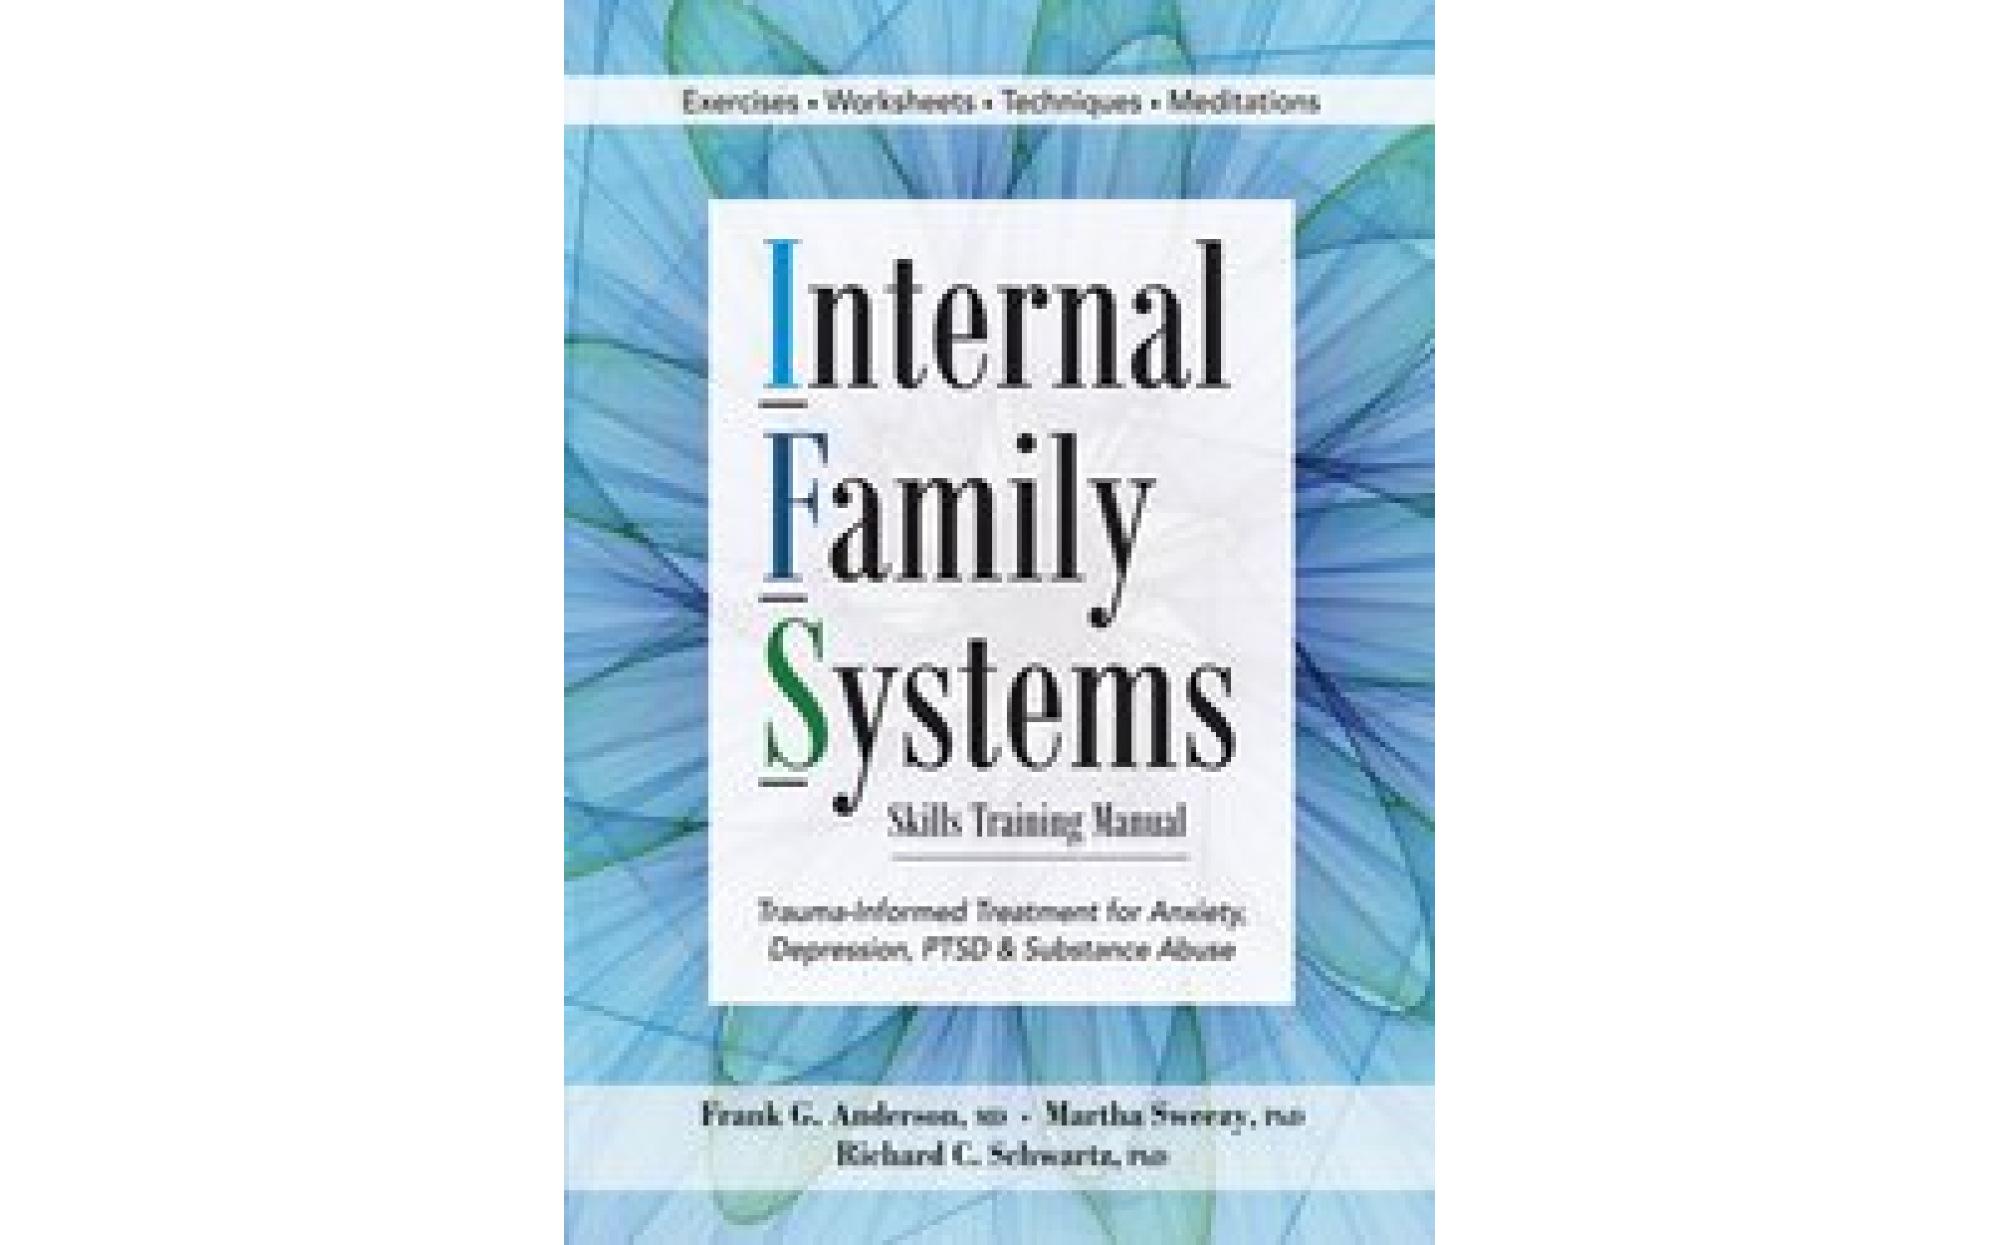 Internal Family Systems Skills Training Manual Books